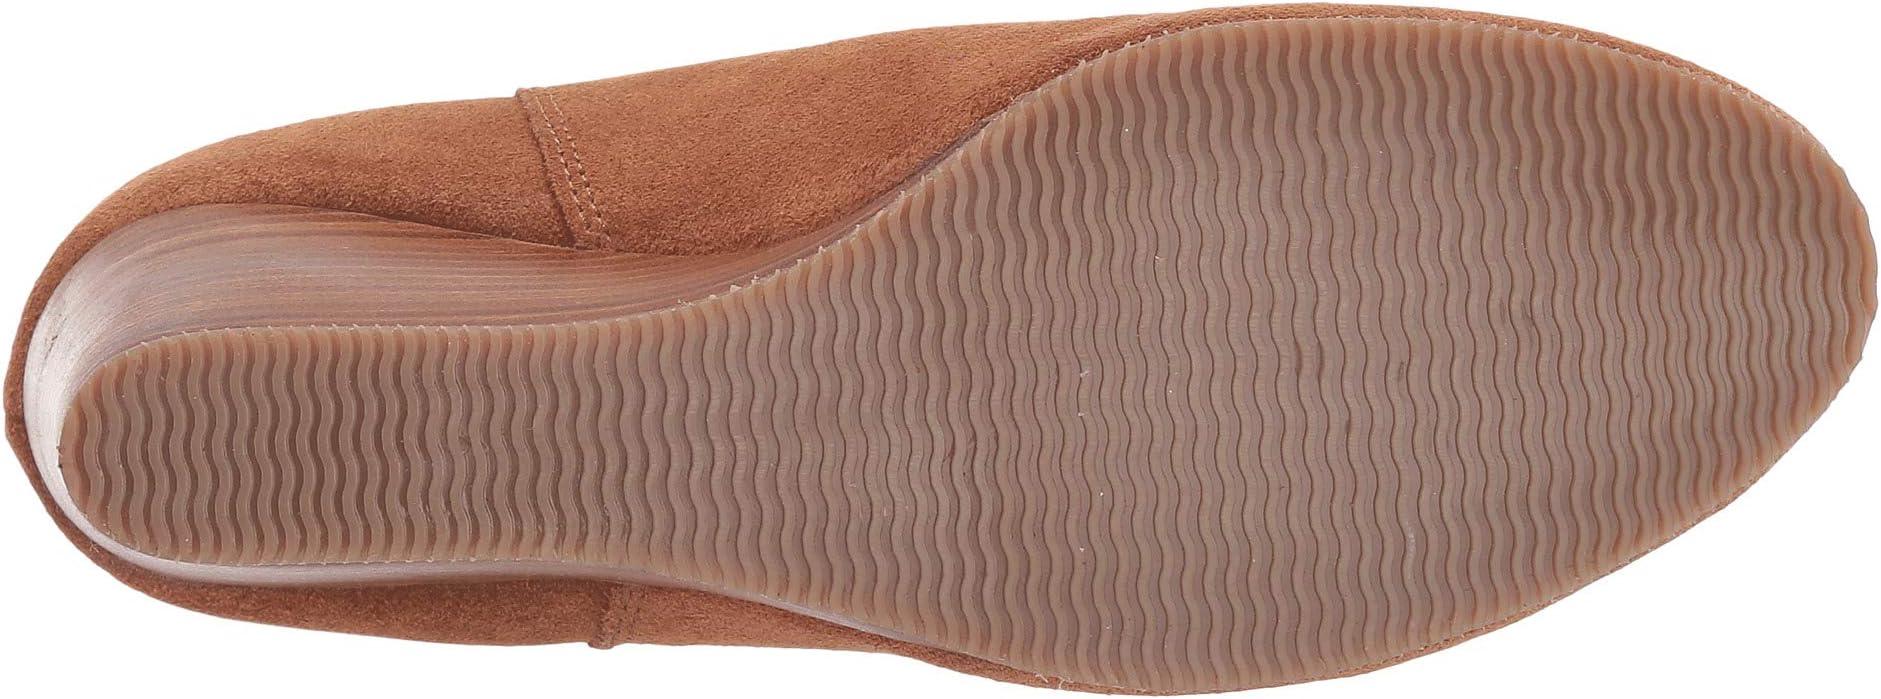 Diba True Now Wow   Women's shoes   2020 Newest